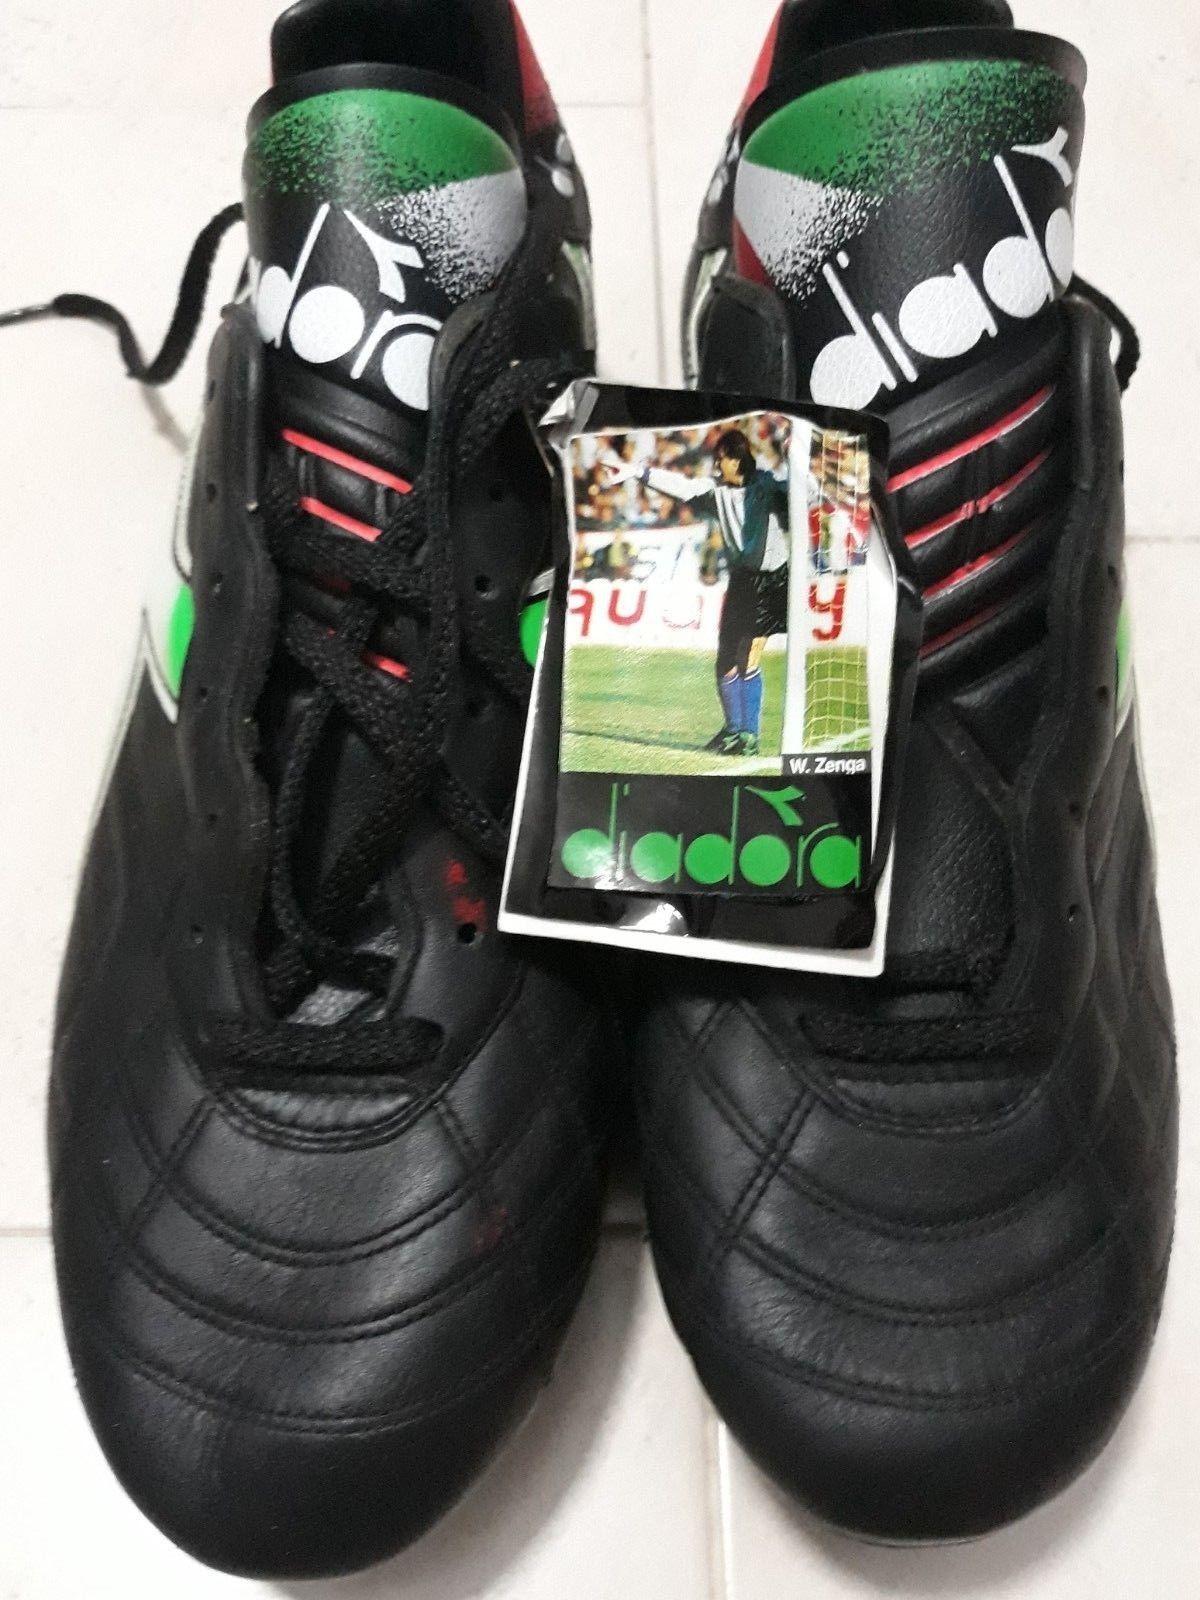 Diadora Scarpe 90's Zenga Size 11 W Calcio Boots Soccer Vintage TXZATS